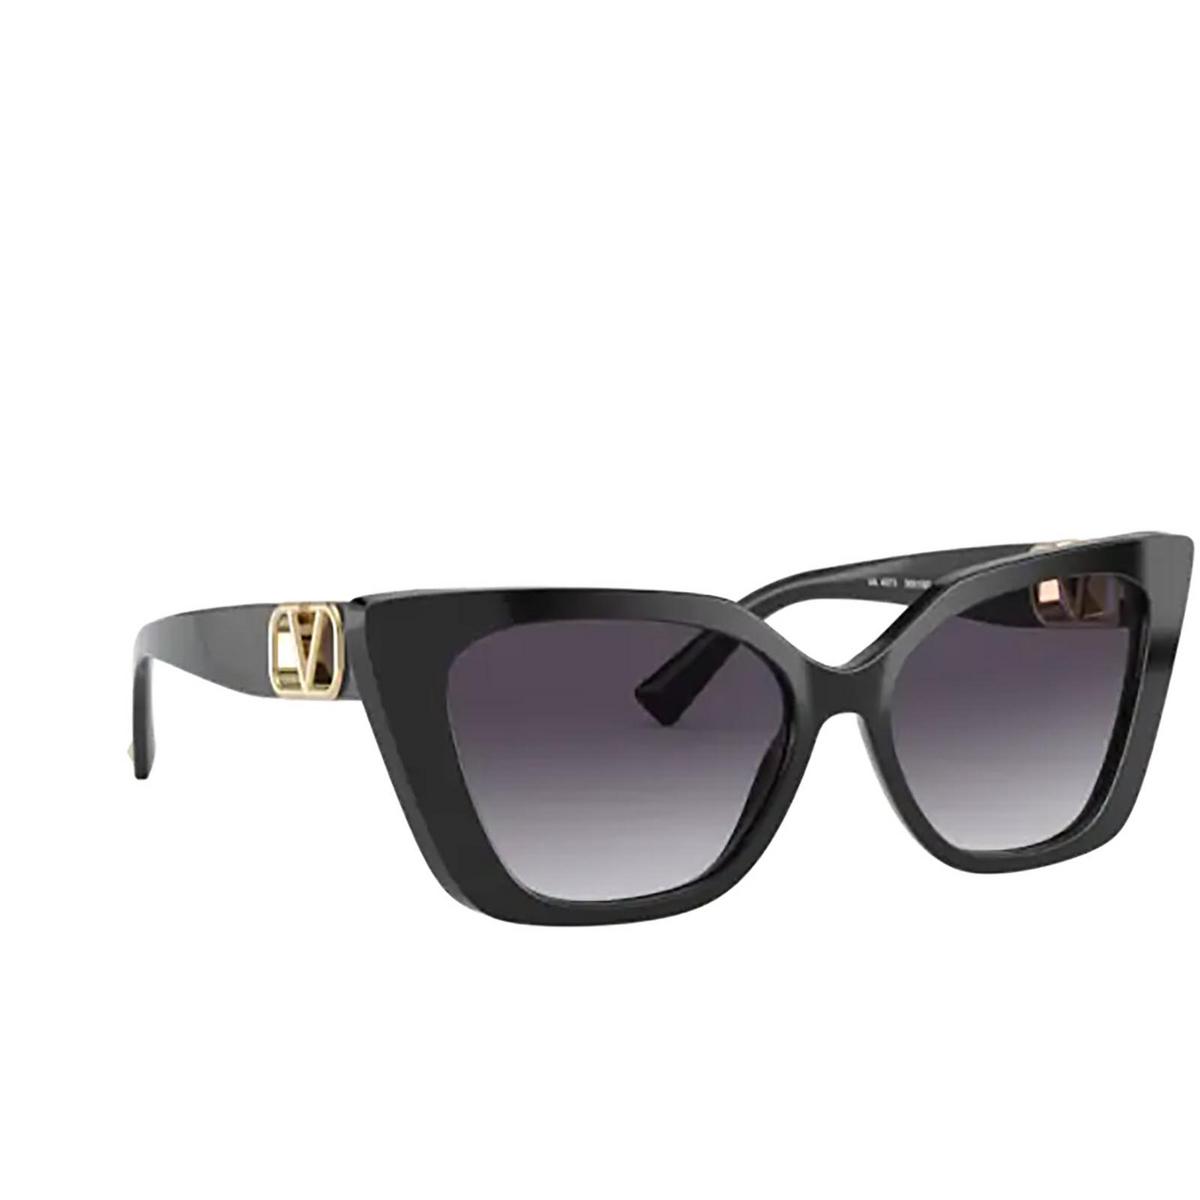 Valentino® Cat-eye Sunglasses: VA4073 color Black 50018G - three-quarters view.